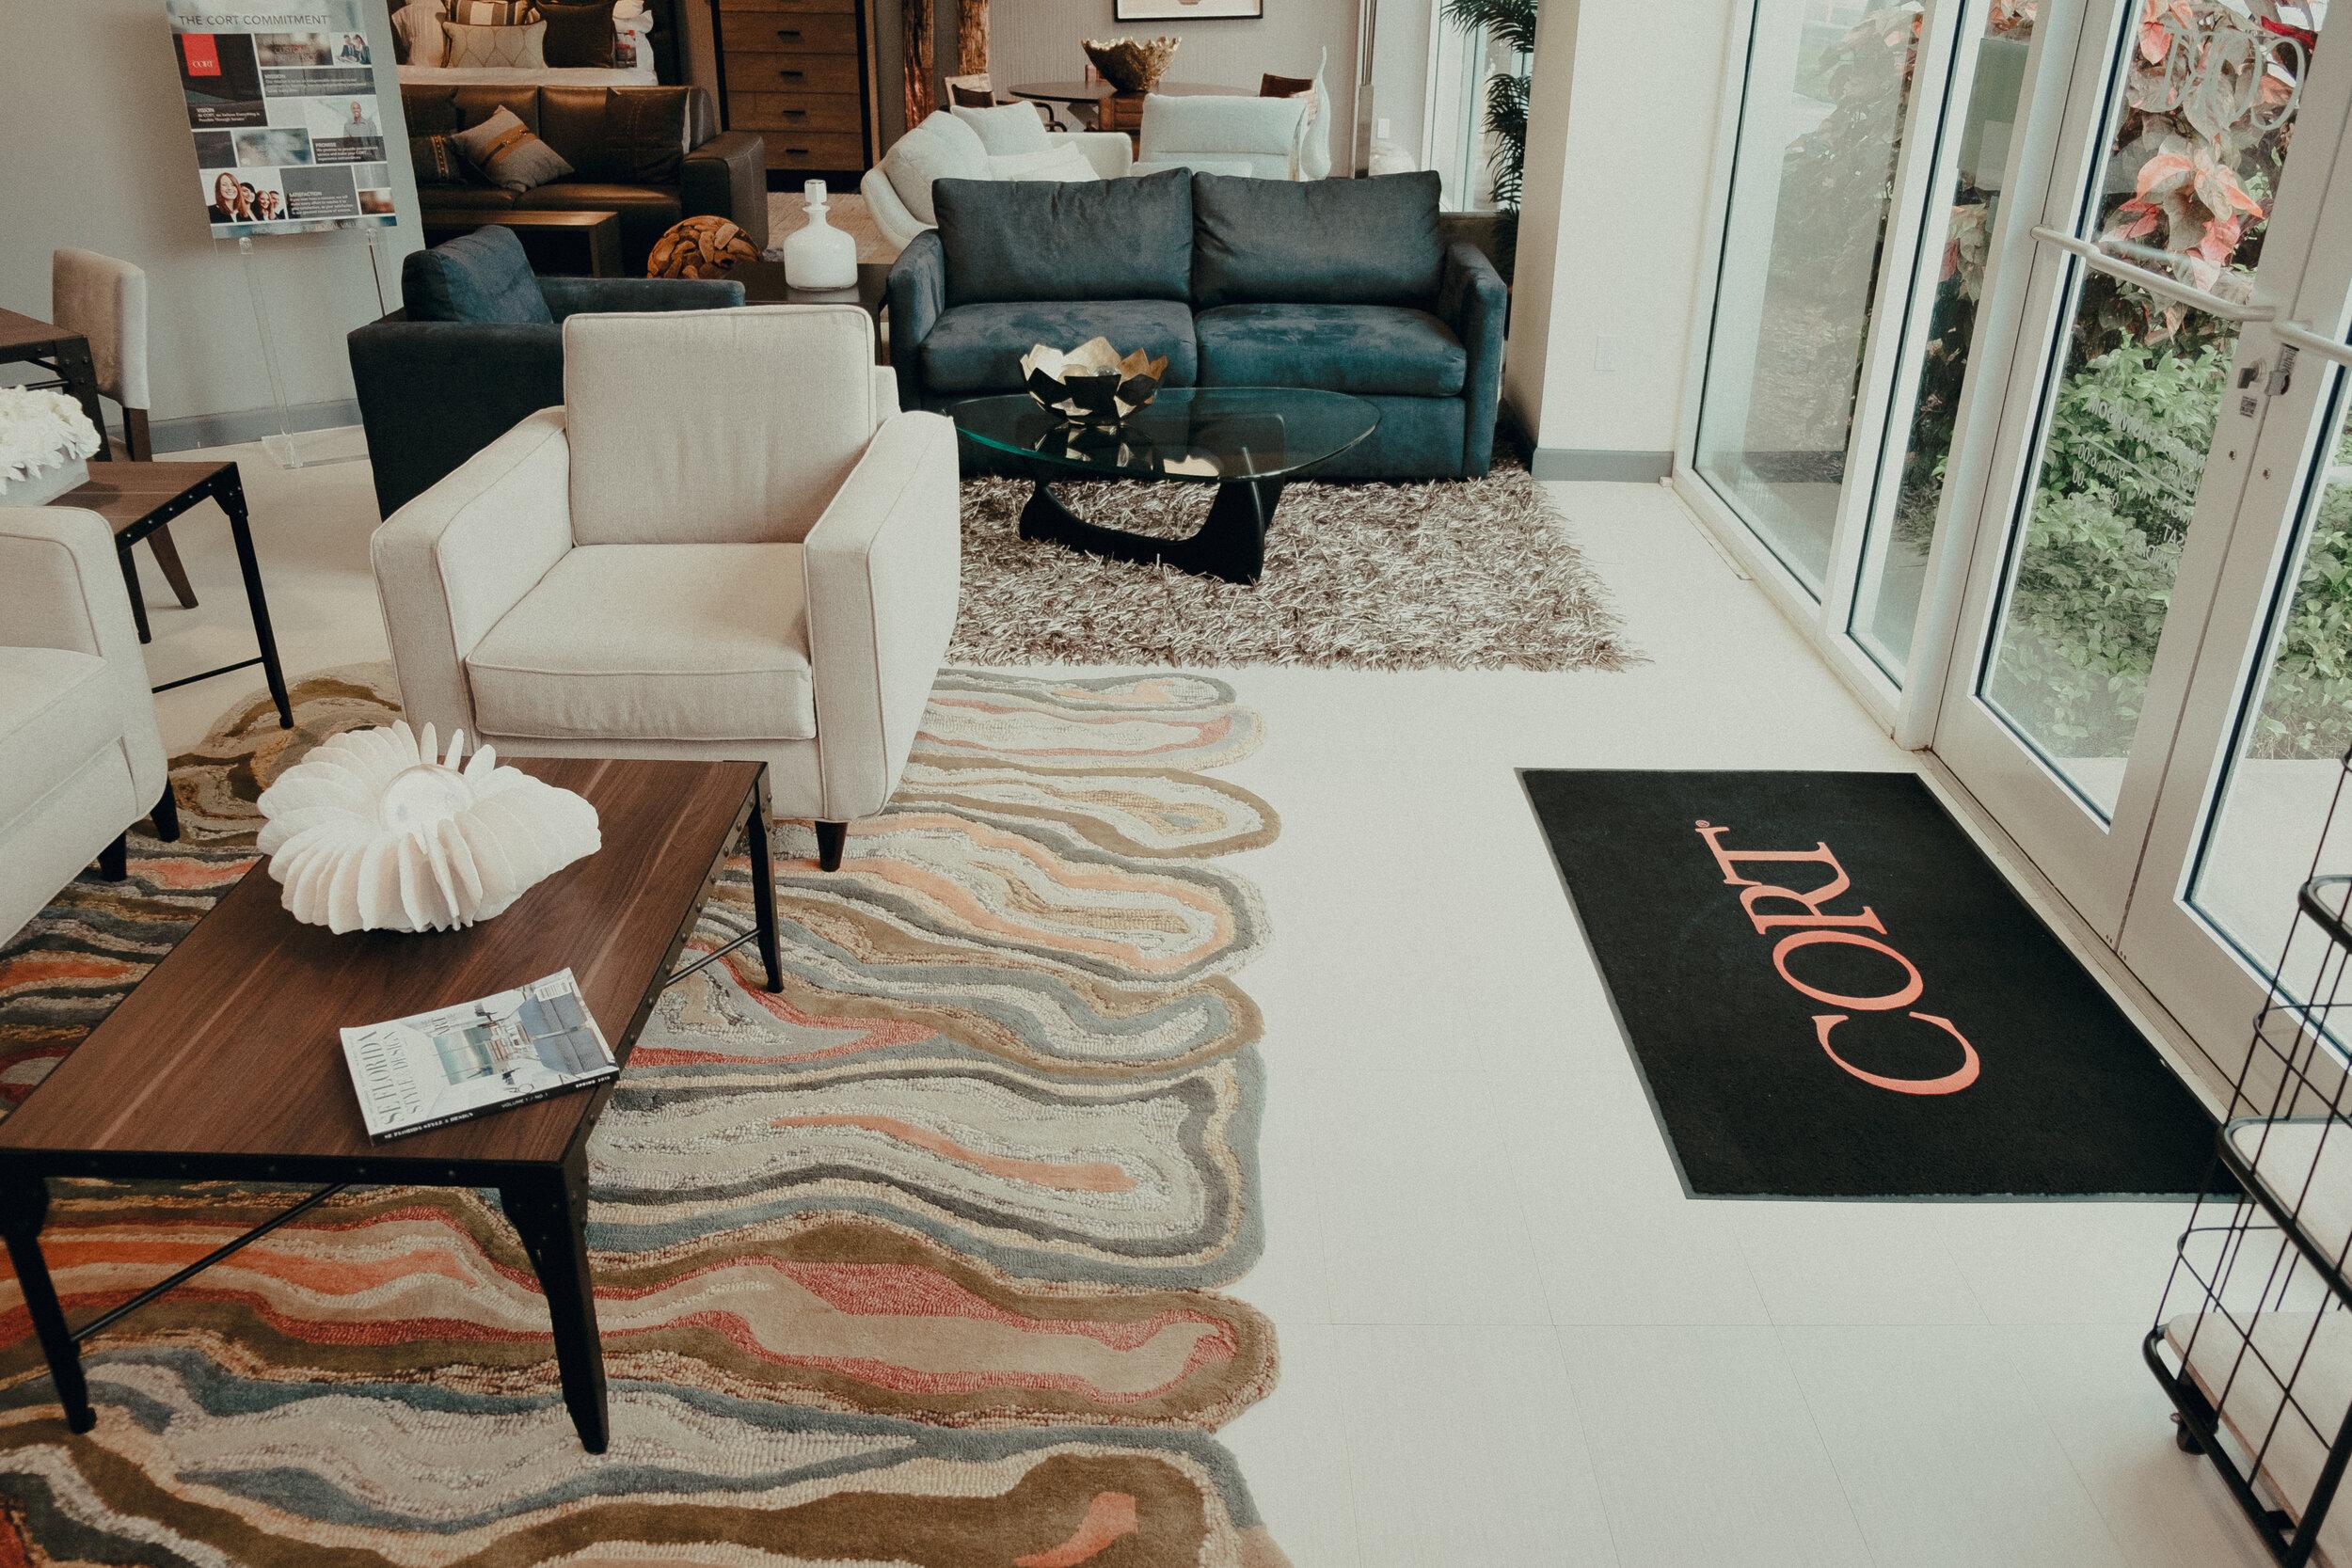 How CORT Furniture Rental Works